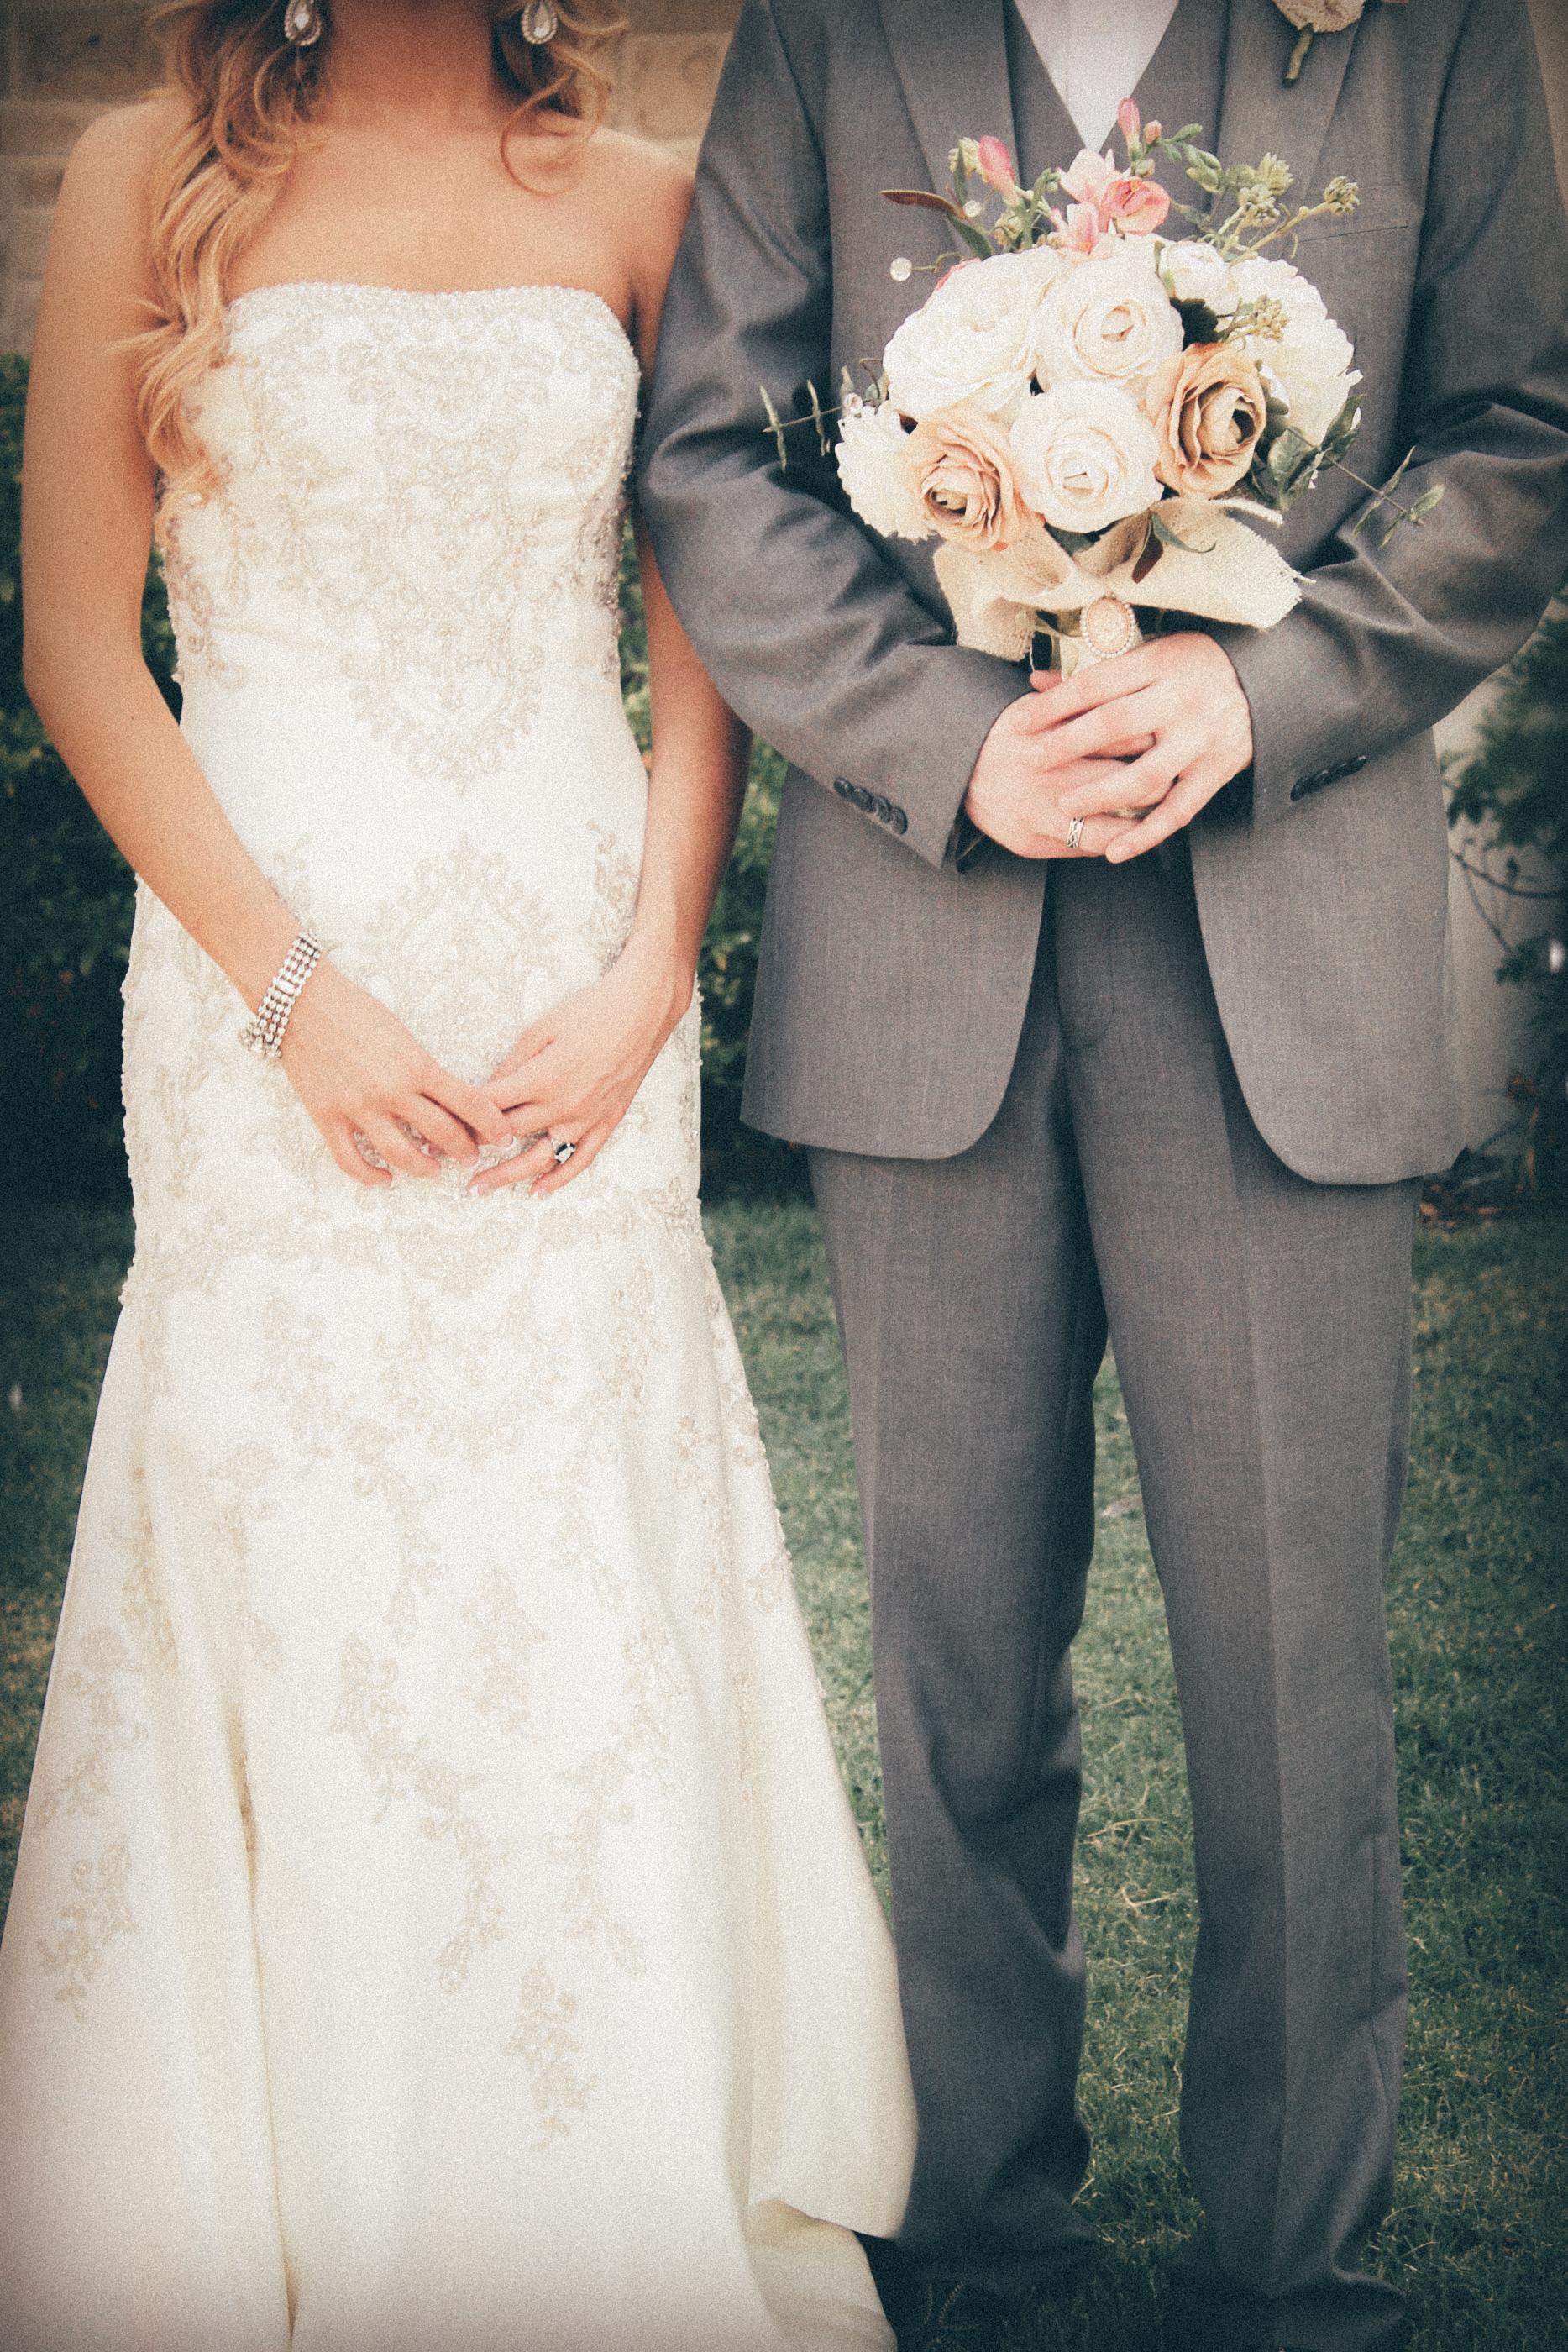 Daniel and Sam Mow Wedding Tulsa | The Picture People LA | Christi Childs (7 of 22).jpg